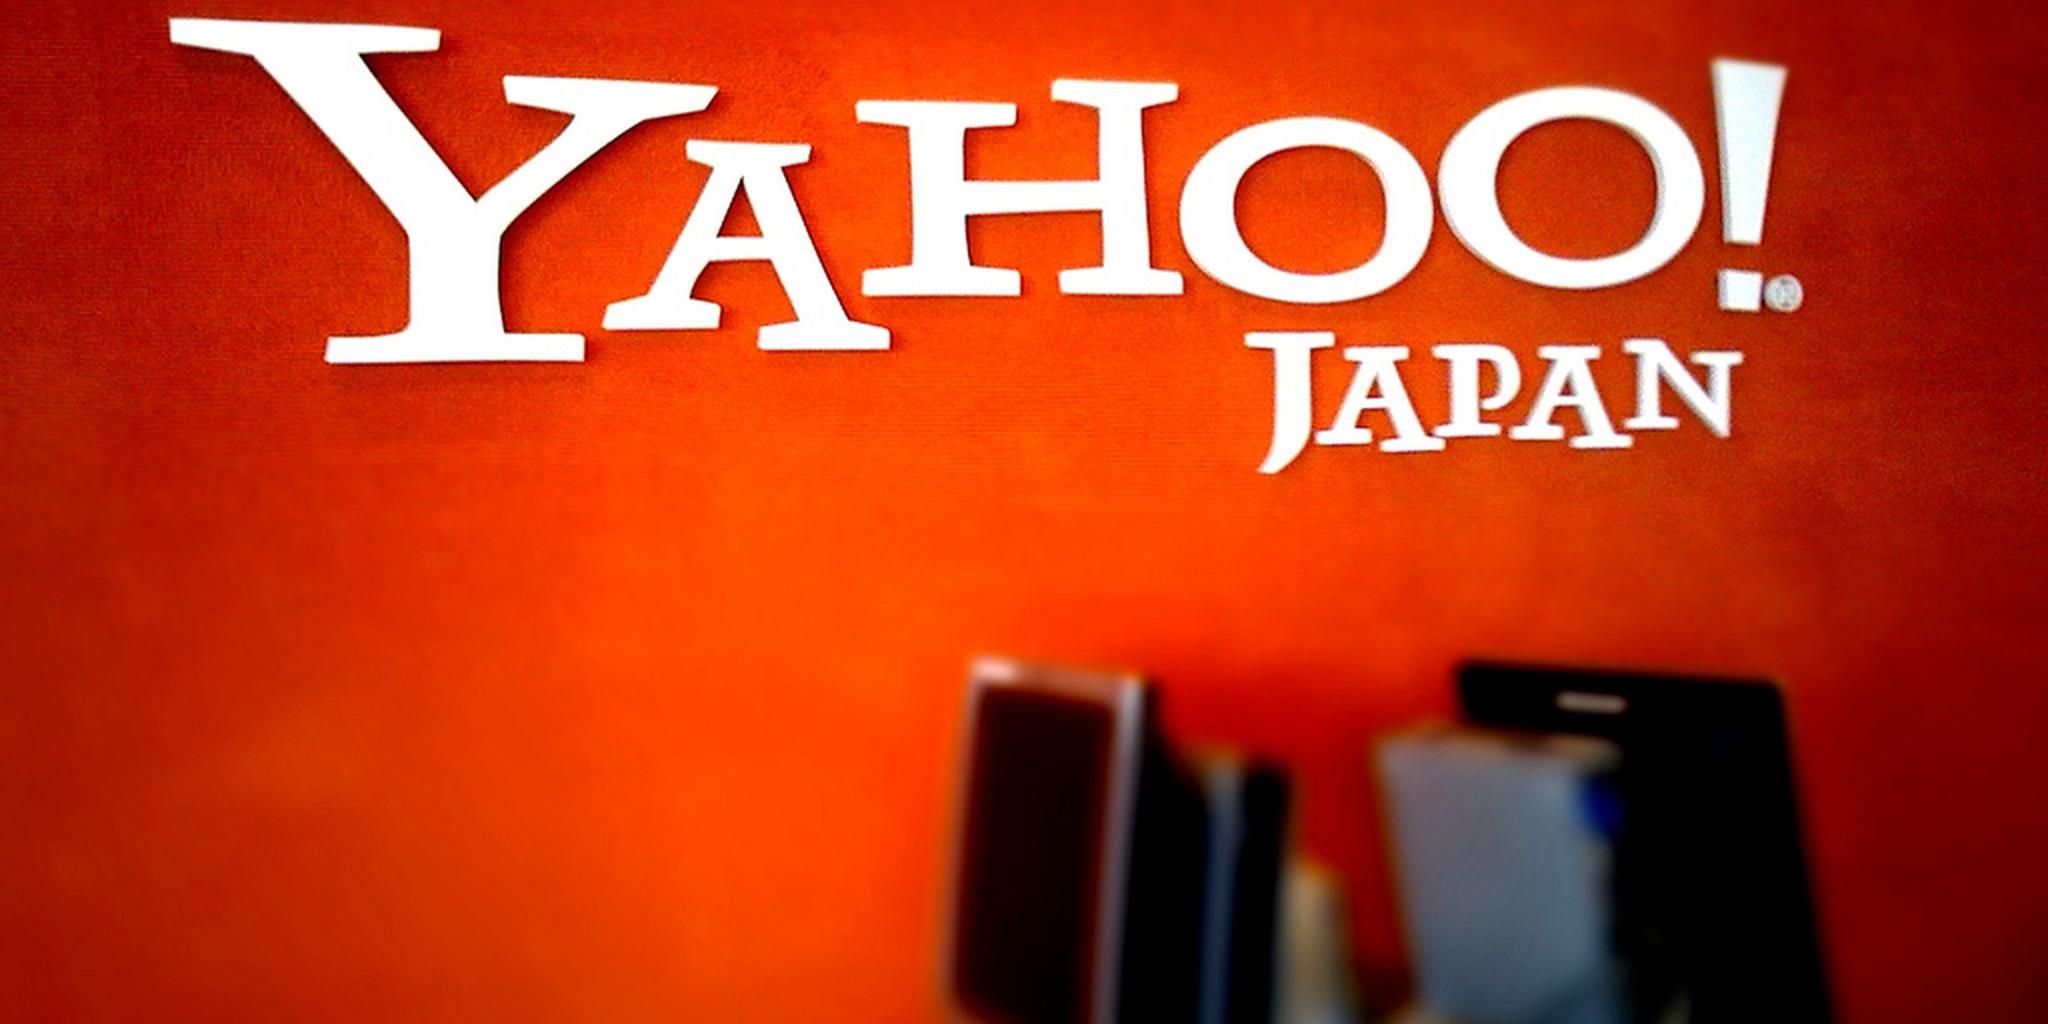 All sizes | Yahoo!Japan | Flickr - Photo Sharing!